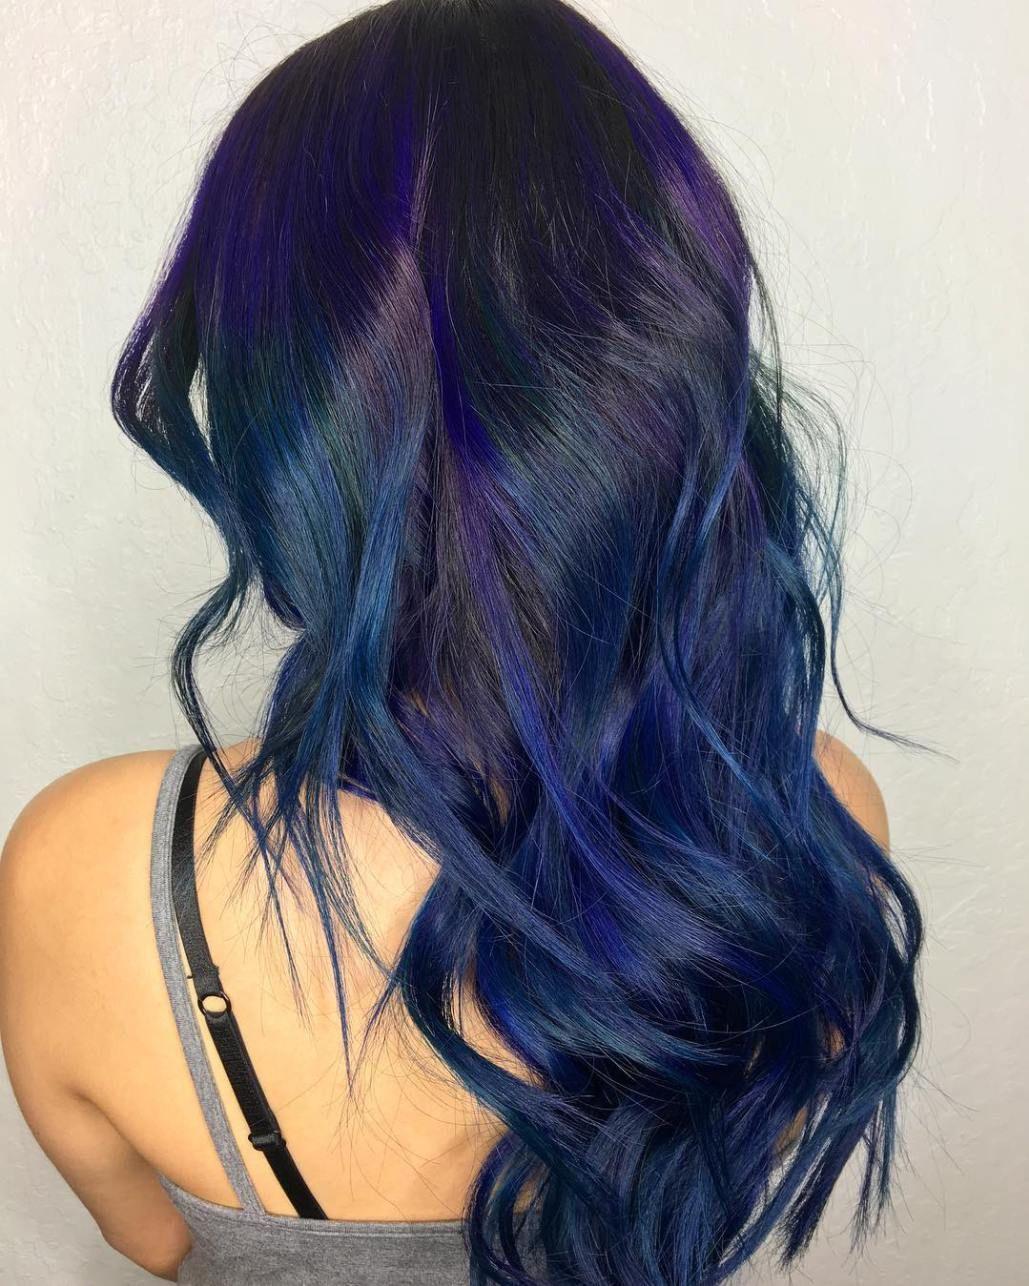 20 Dark Blue Hairstyles That Will Brighten Up Your Look Black Hair With Highlights Dark Blue Hair Blue Hair